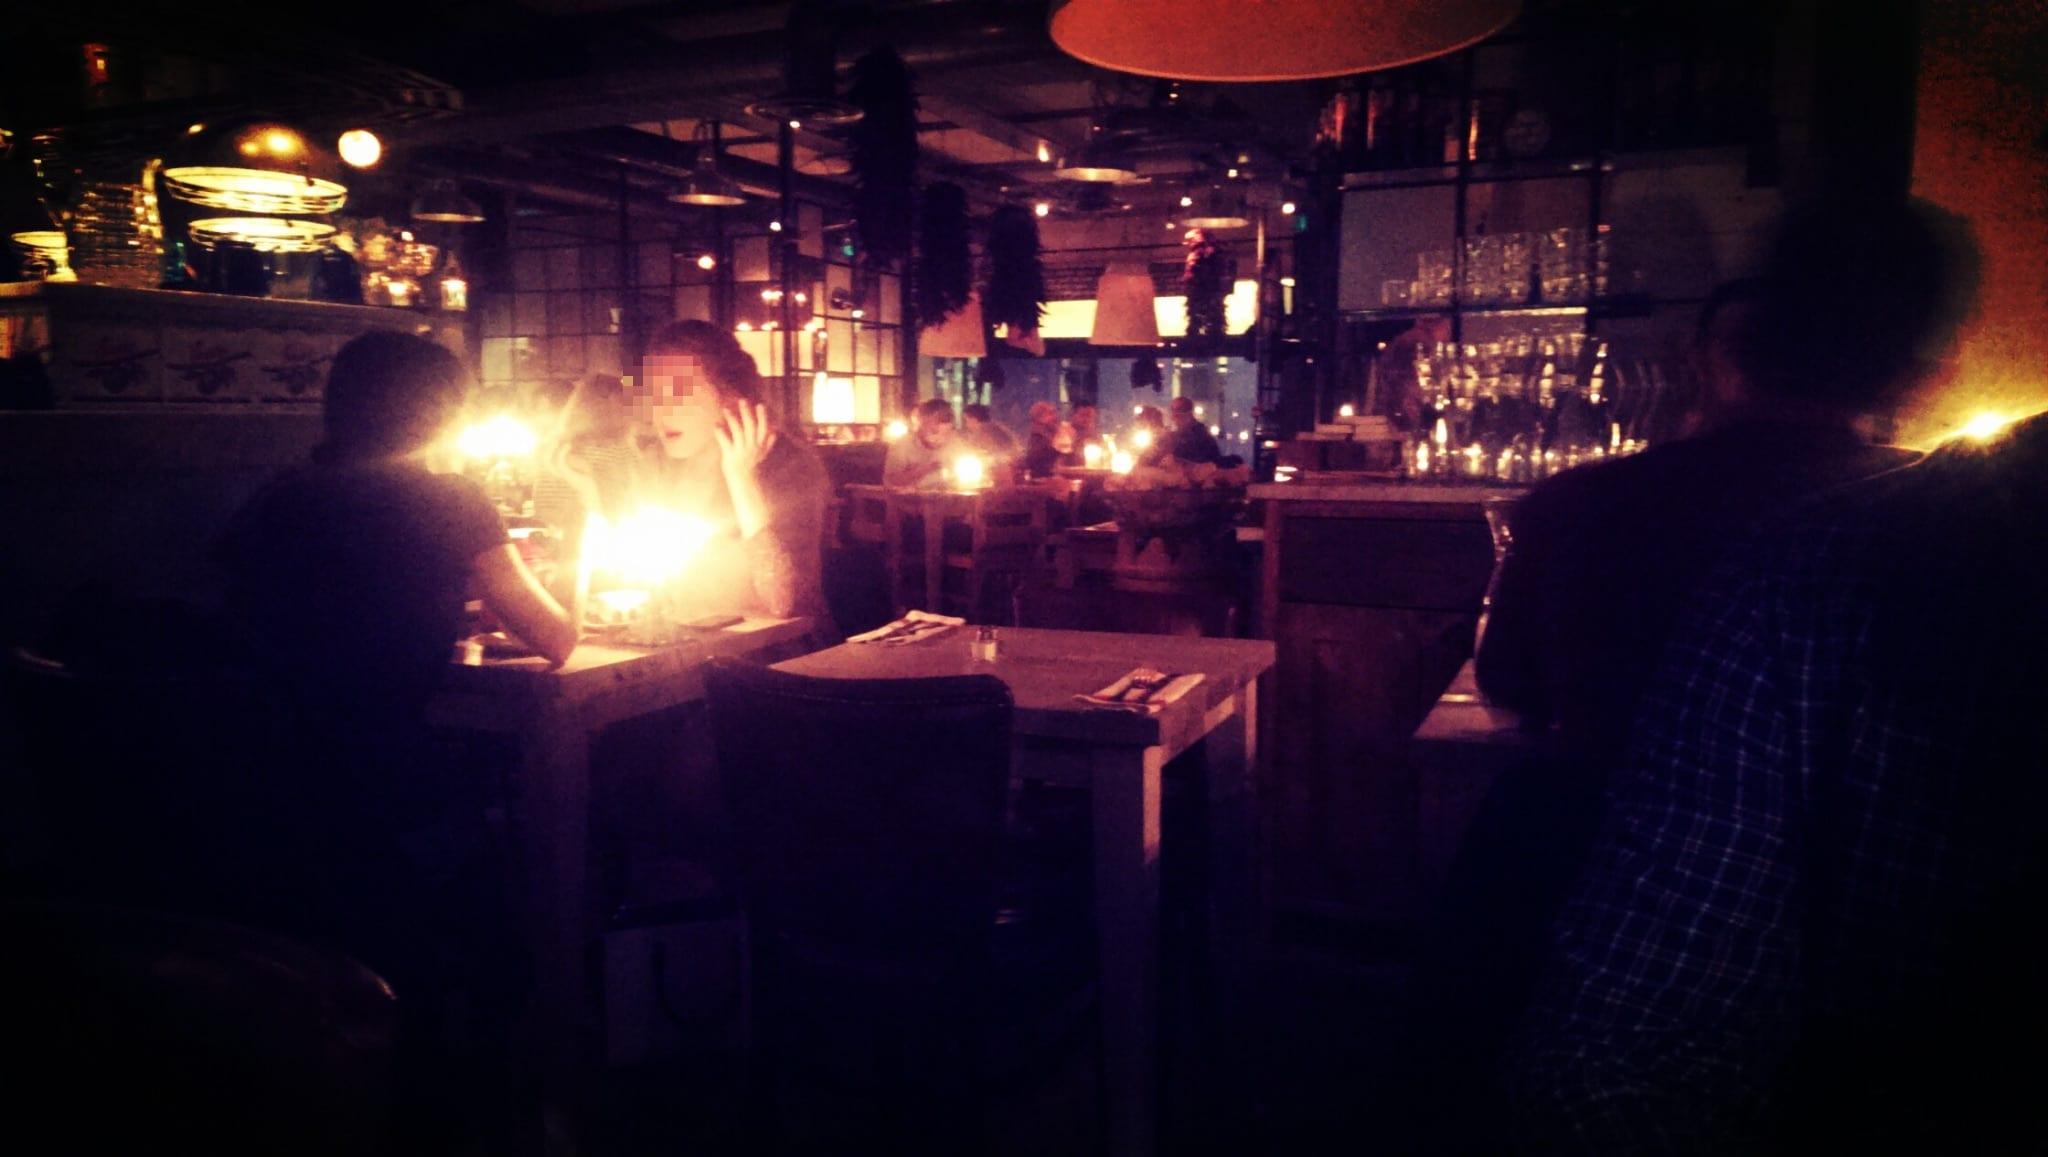 Bills London Candle Light Dinner